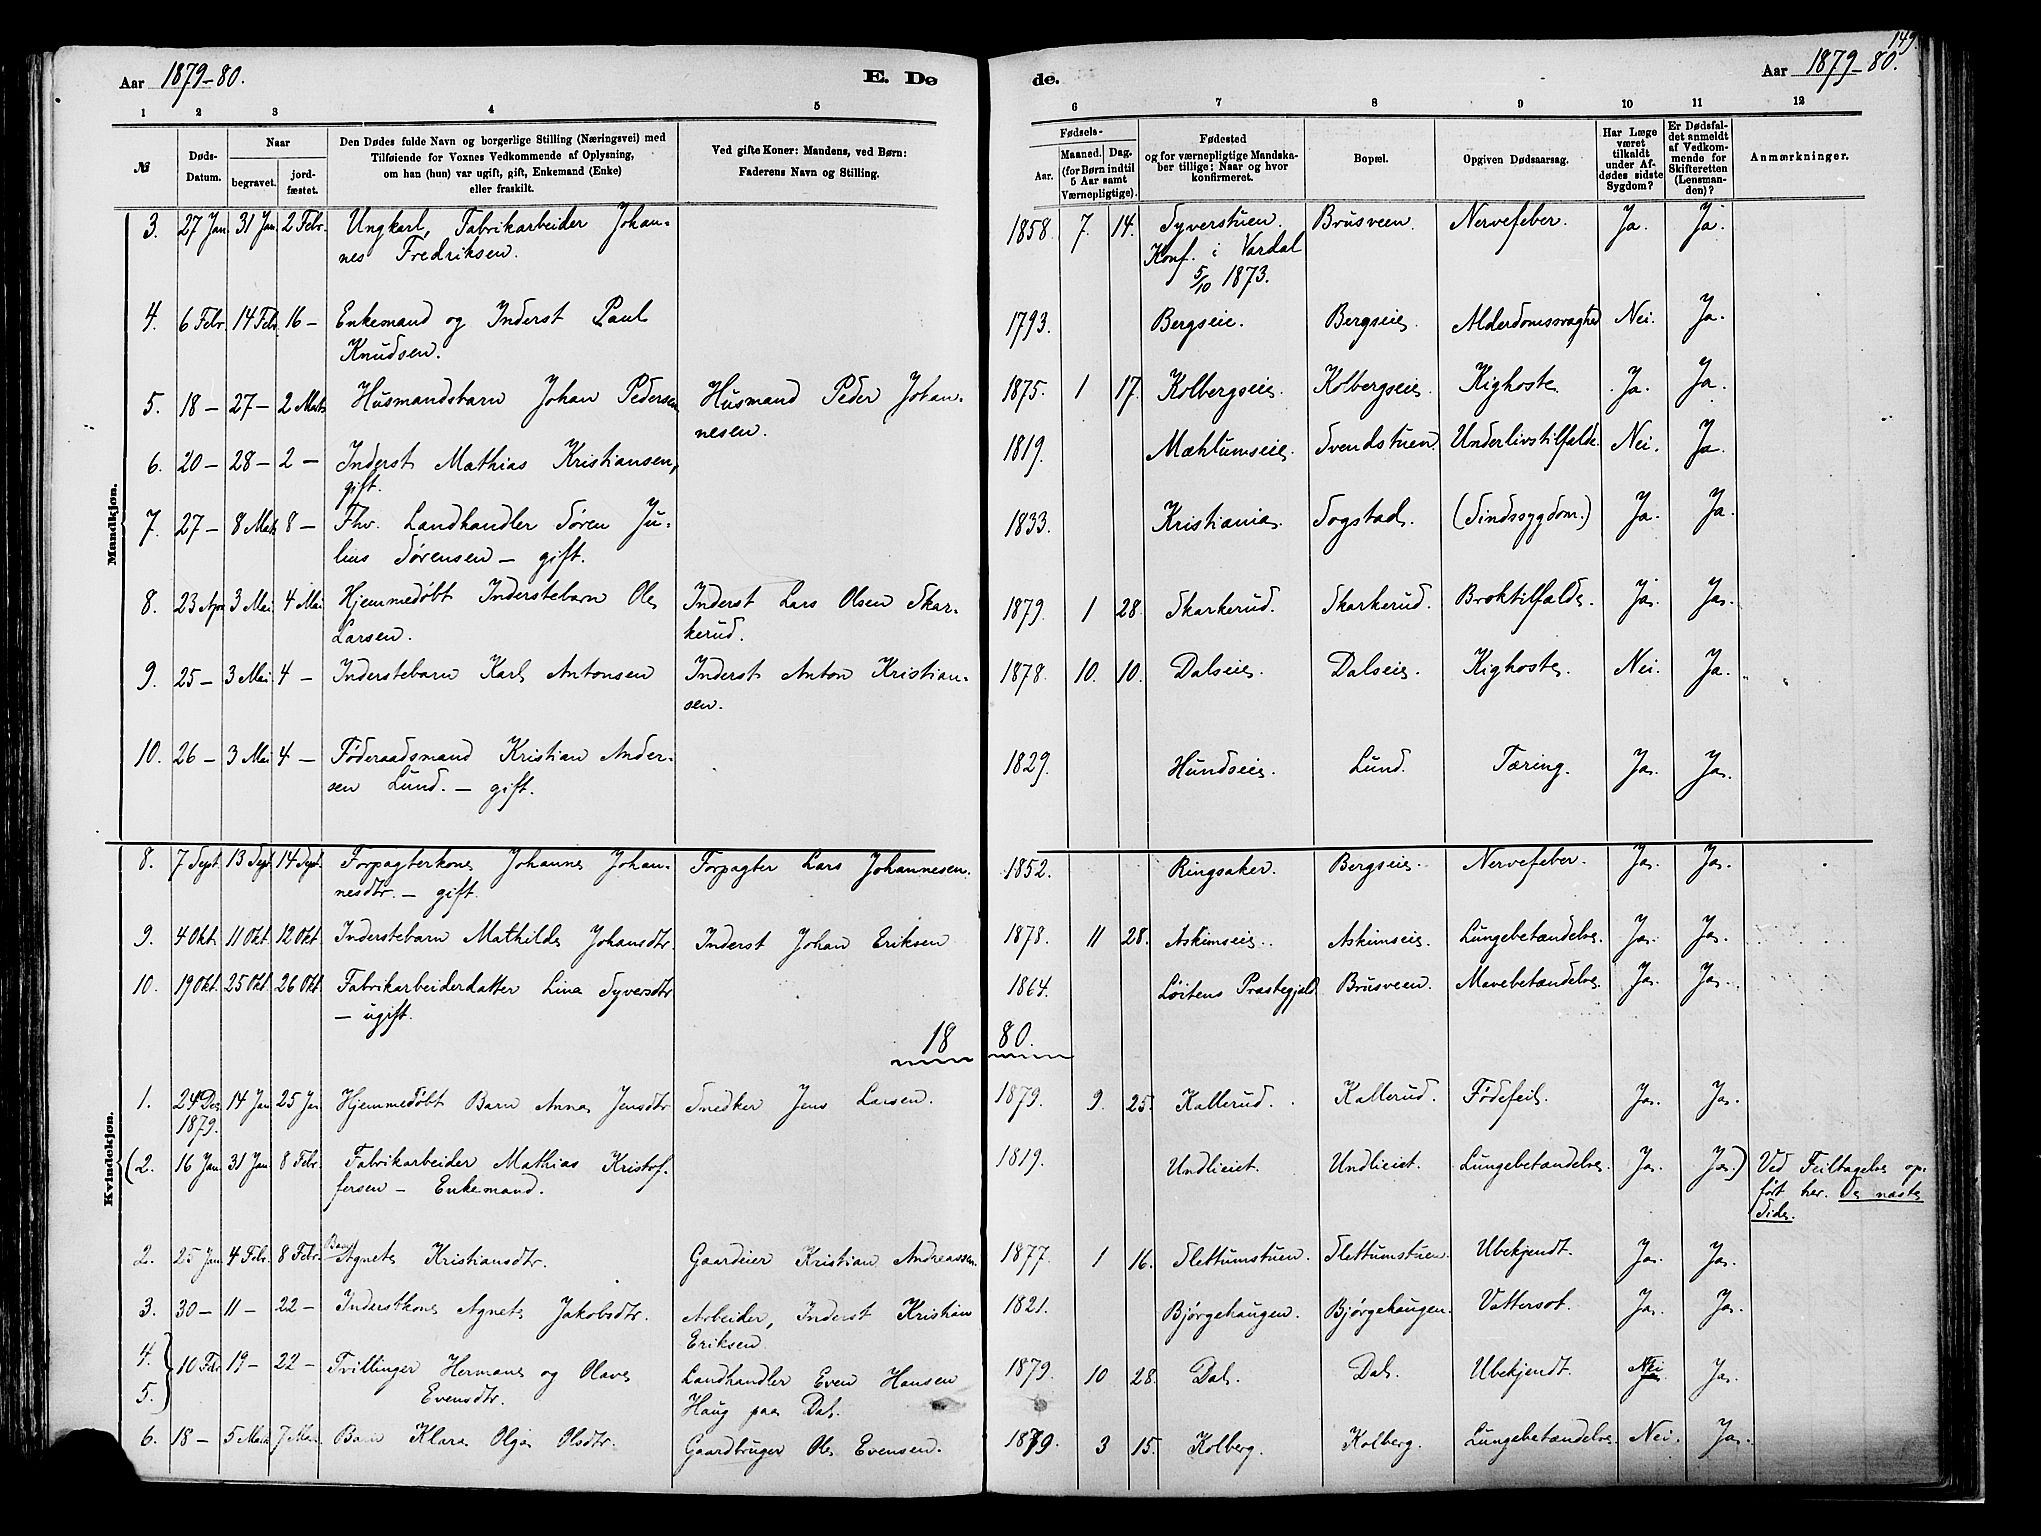 SAH, Vardal prestekontor, H/Ha/Haa/L0009: Ministerialbok nr. 9, 1878-1892, s. 149